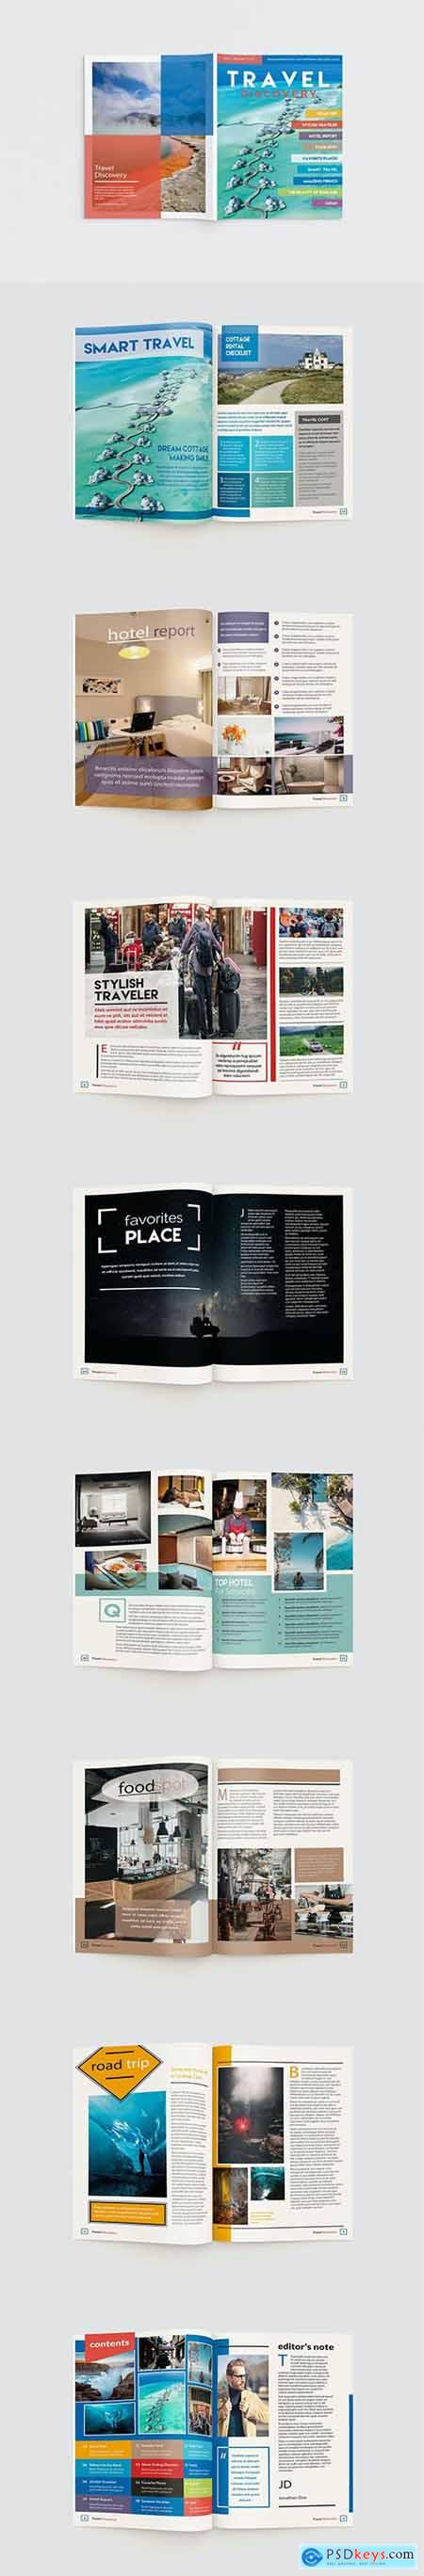 Travel Discovery Magazine